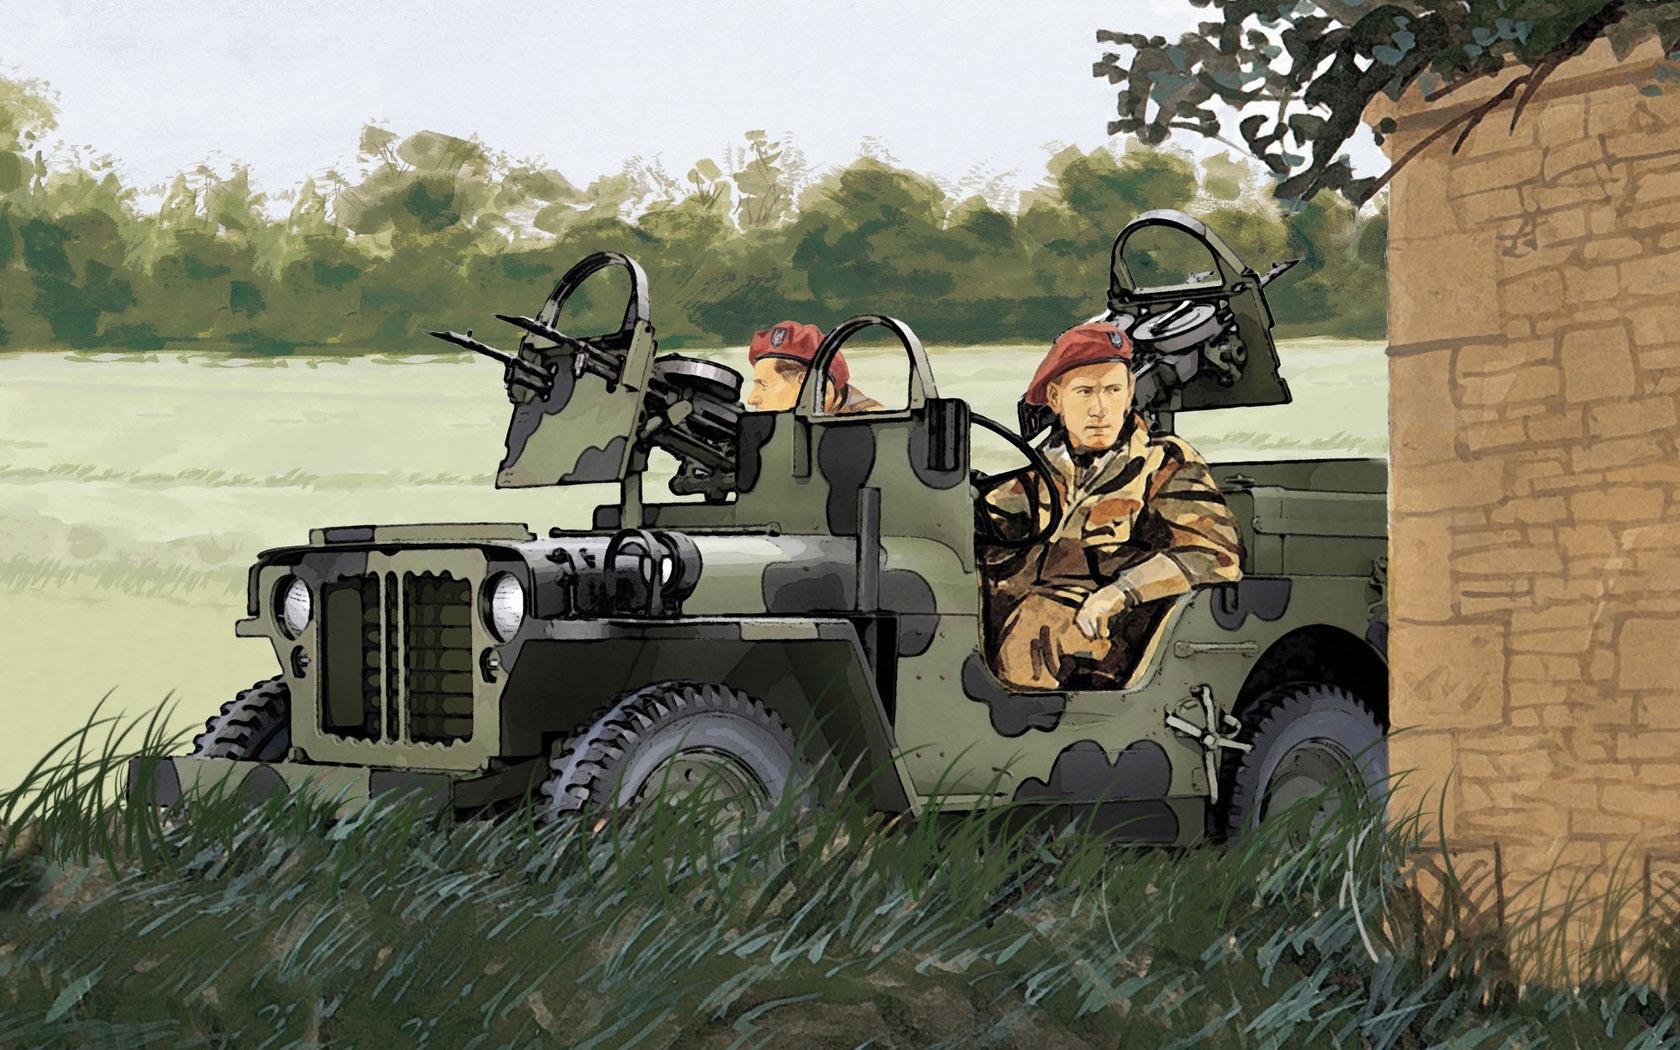 рисунок SAS Raider 4x4 Truck